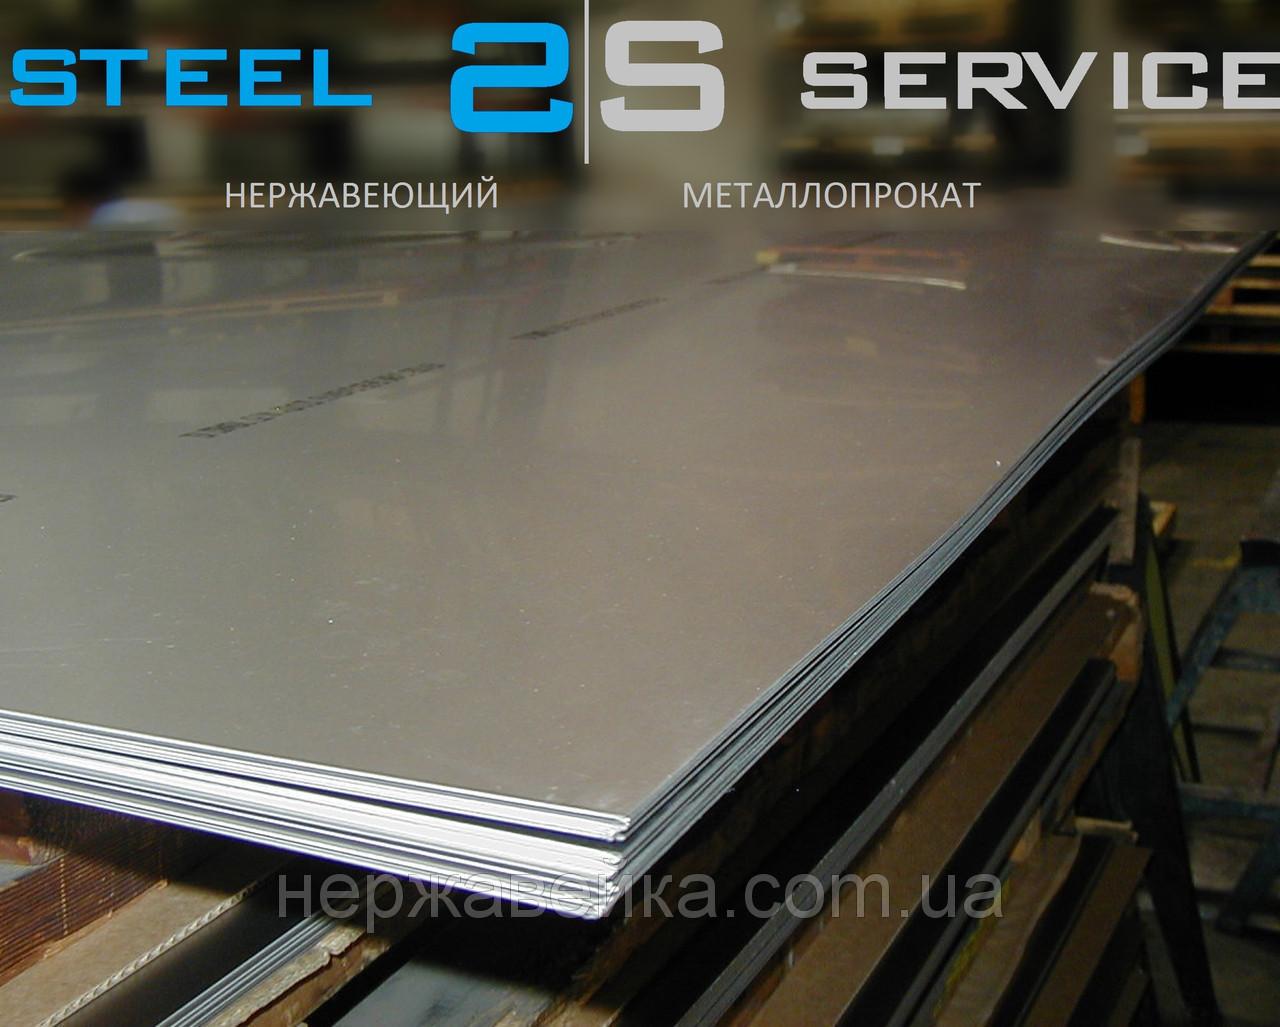 Нержавейка лист 0,8х1500х3000мм AISI 430(12Х17) BA - зеркало, технический